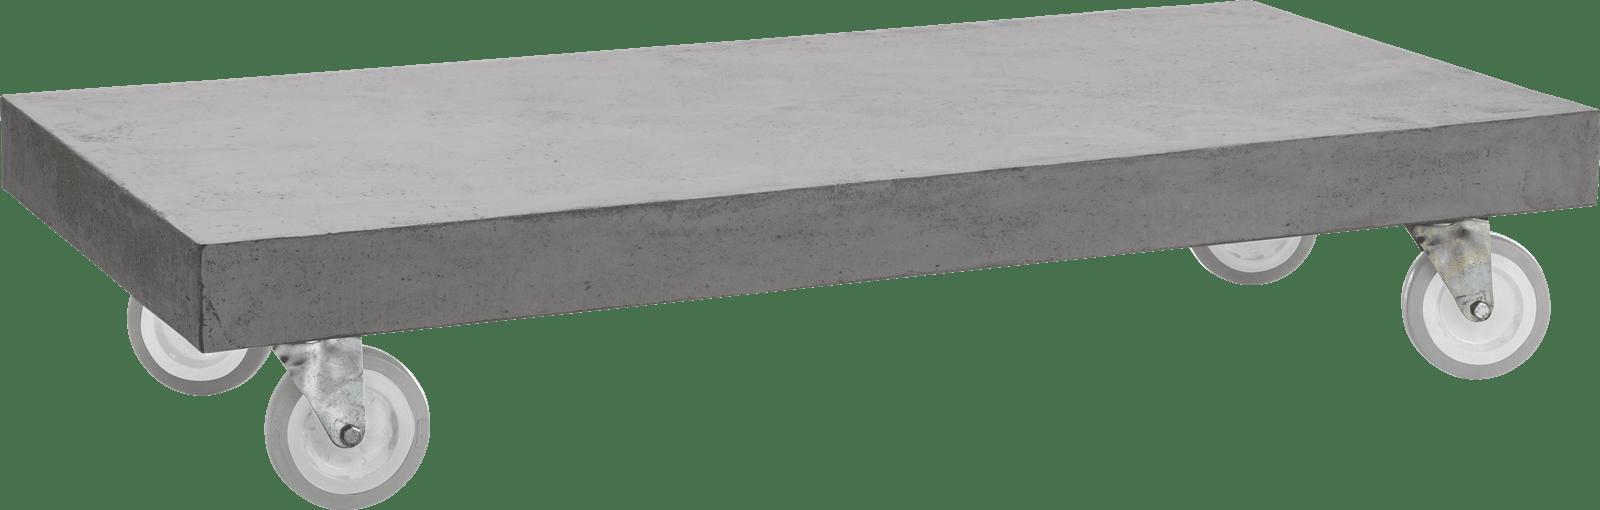 XOOON - Toro - Industriel - table basse 120 x 60 cm